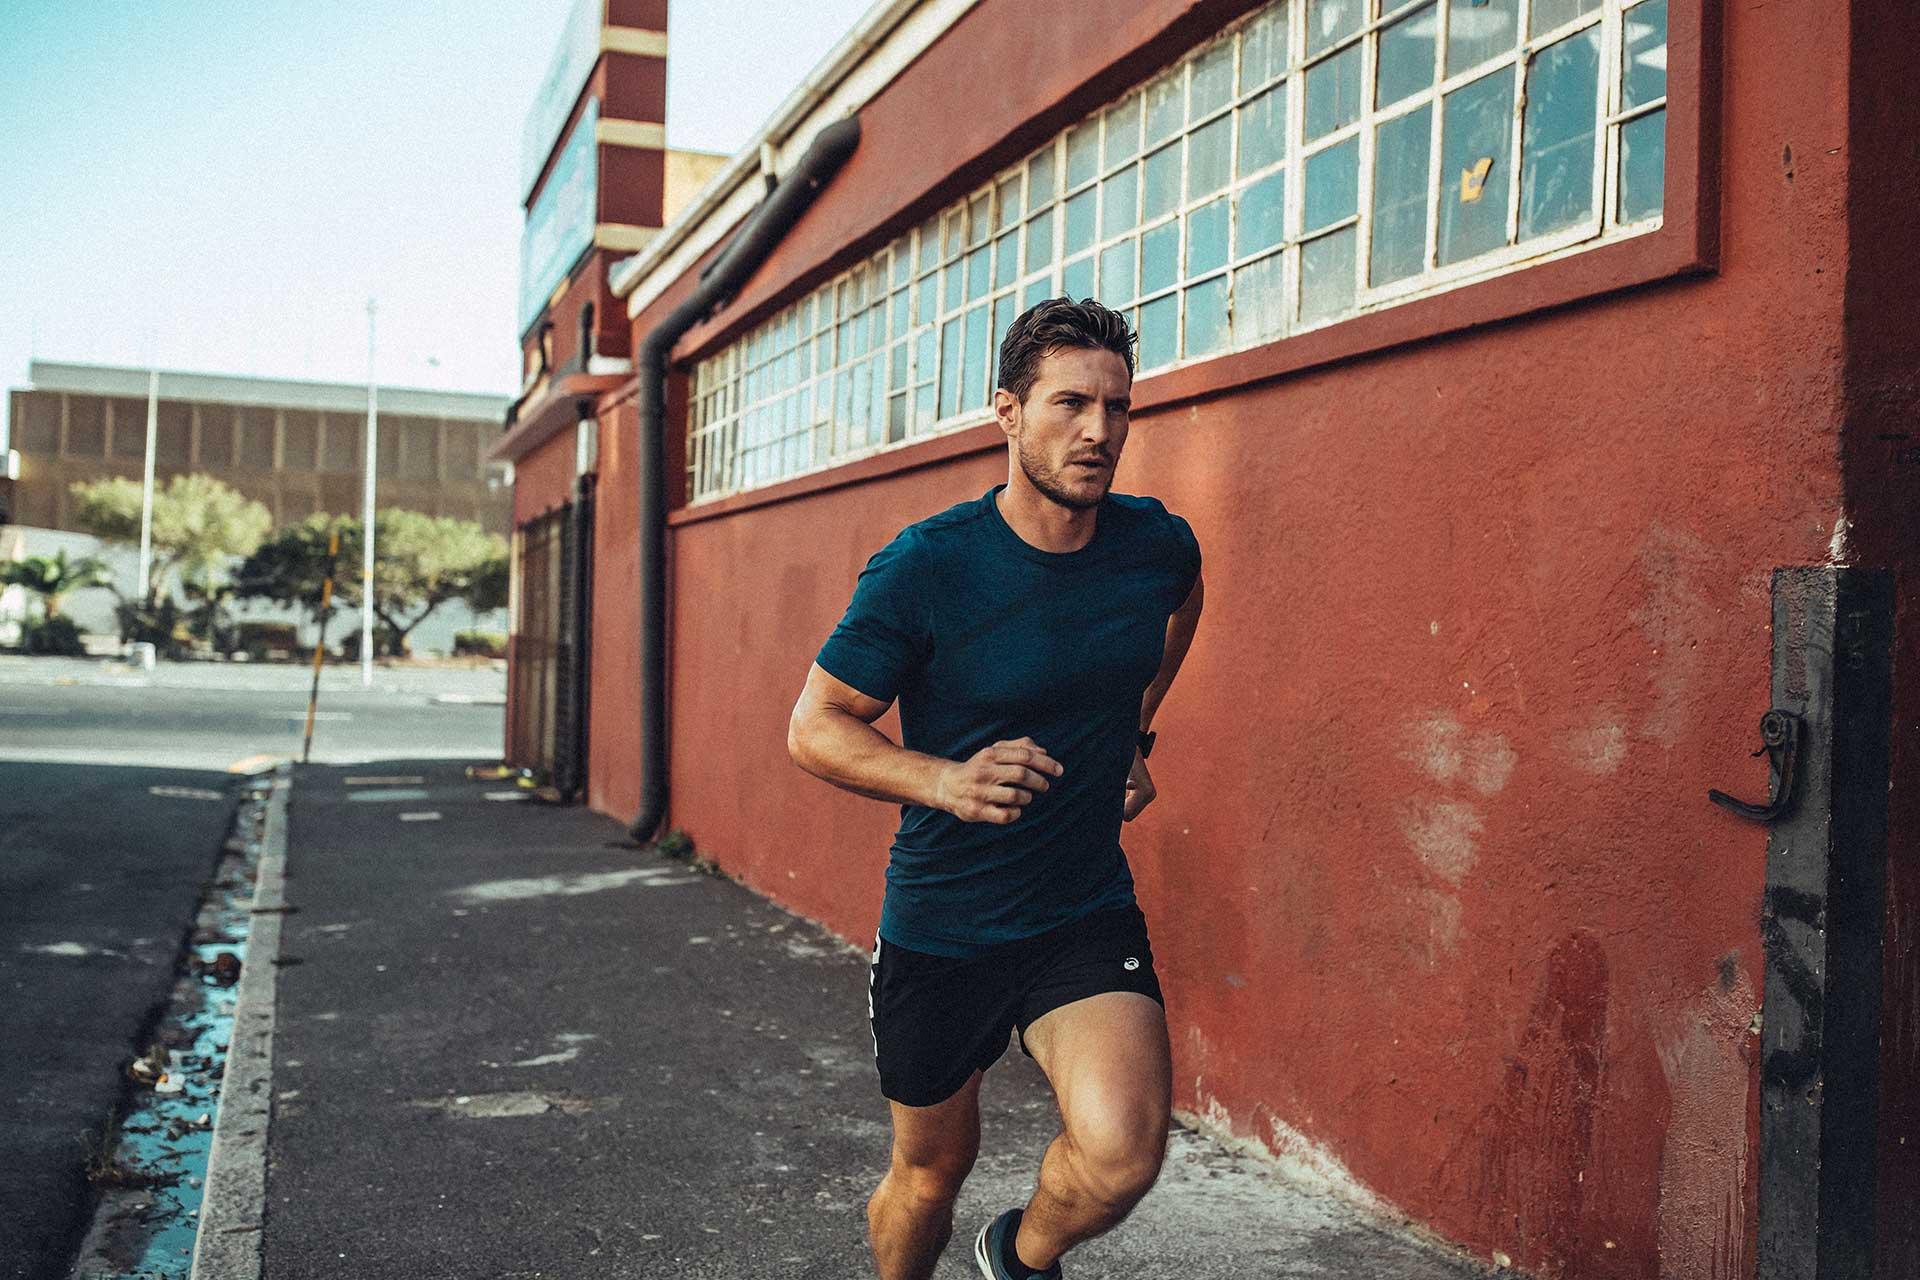 Running Fotograf Stadt Urban Sport Fitness Kapstadt Südafrika